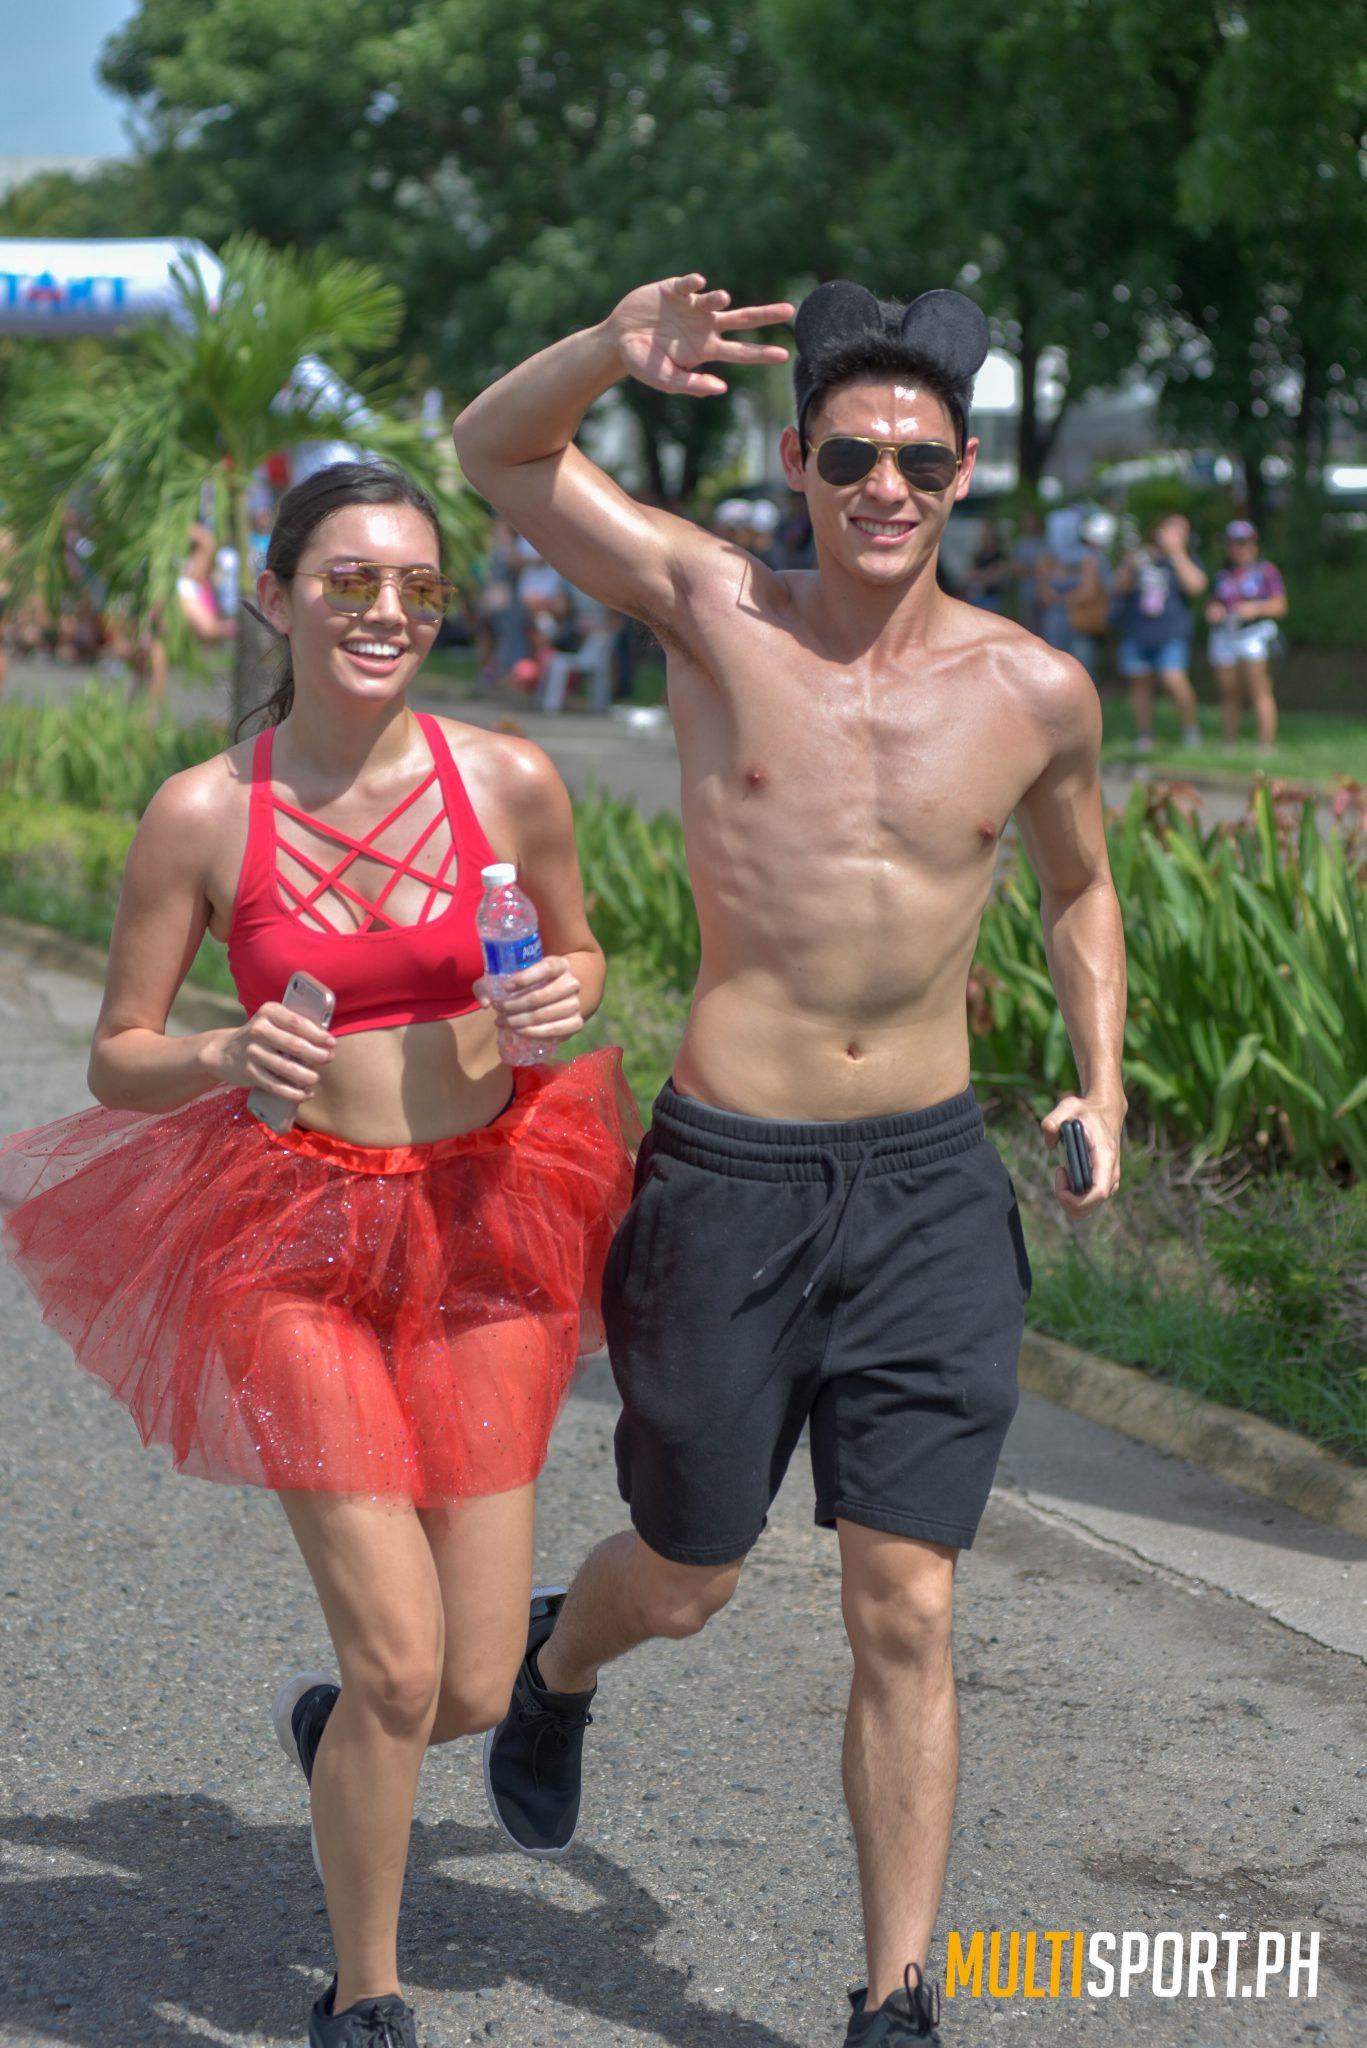 Gallery: The Underpants Run at the 2018 Century Tuna Ironman Philippines